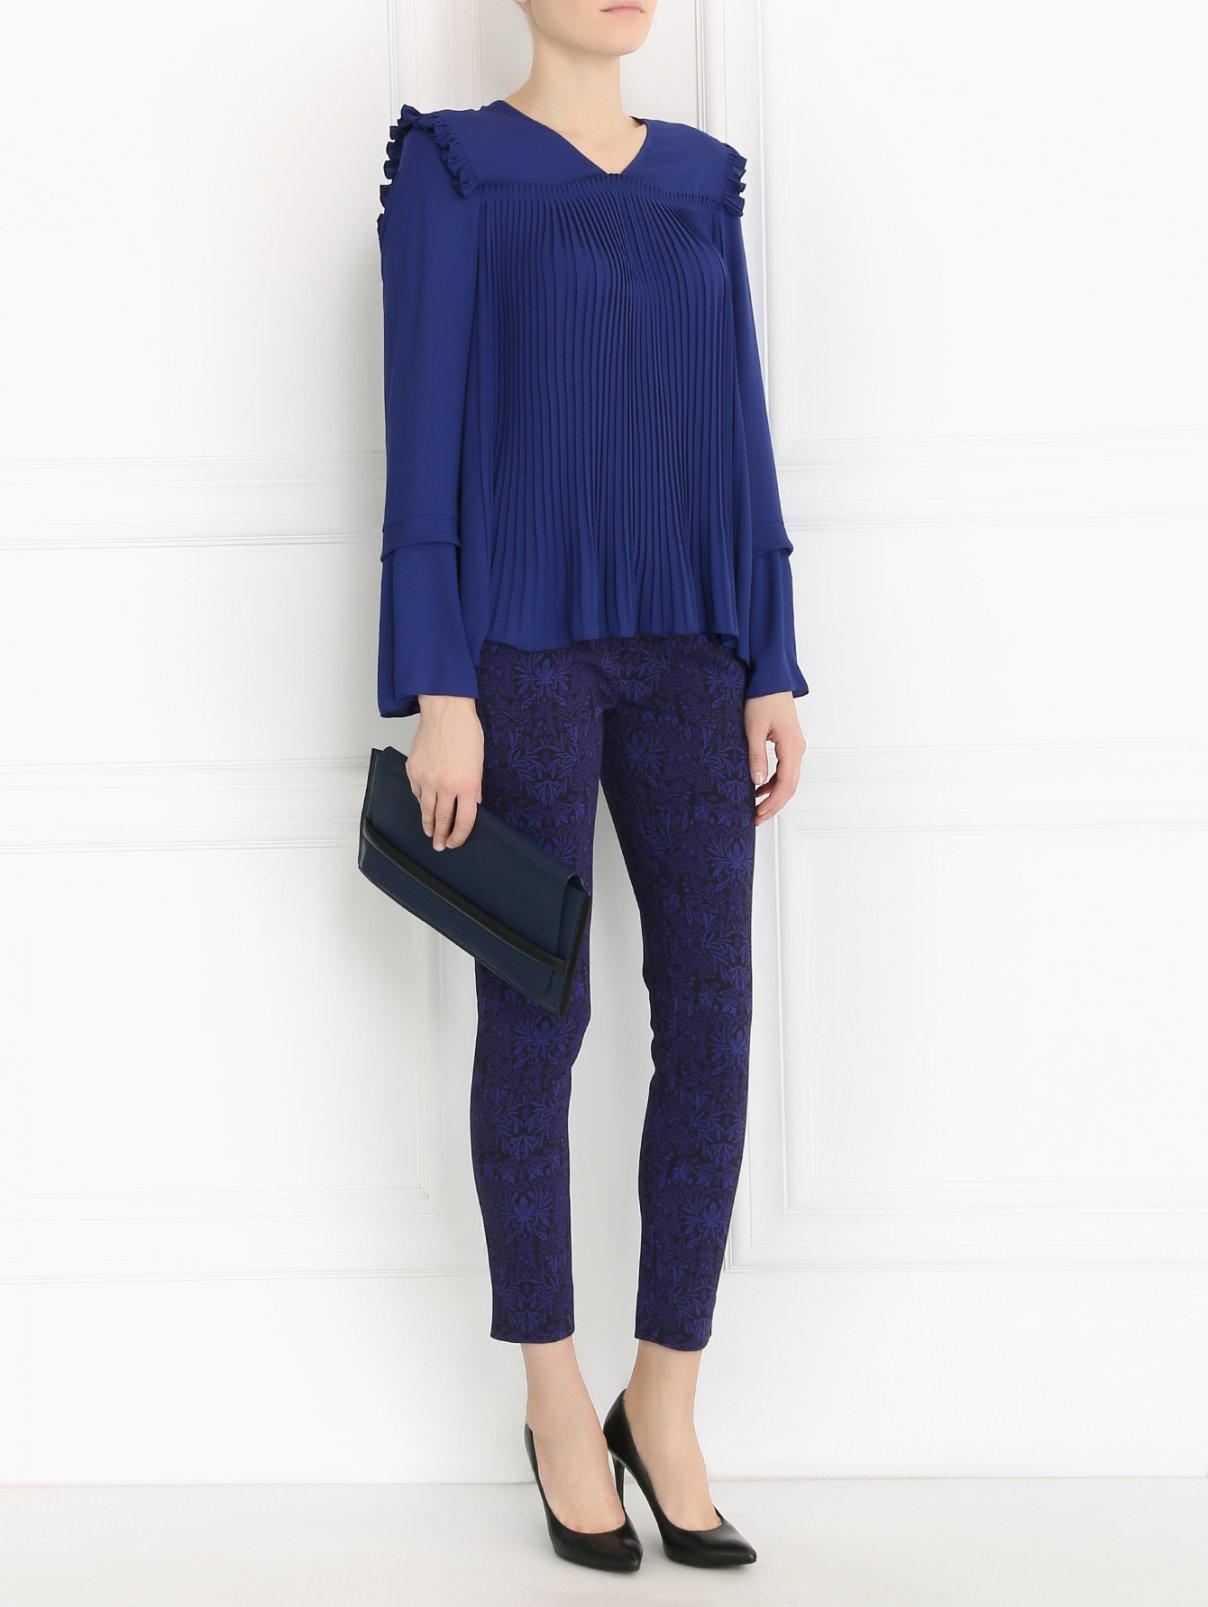 Блуза свободного кроя с рюшами See by Chloé  –  Модель Общий вид  – Цвет:  Синий